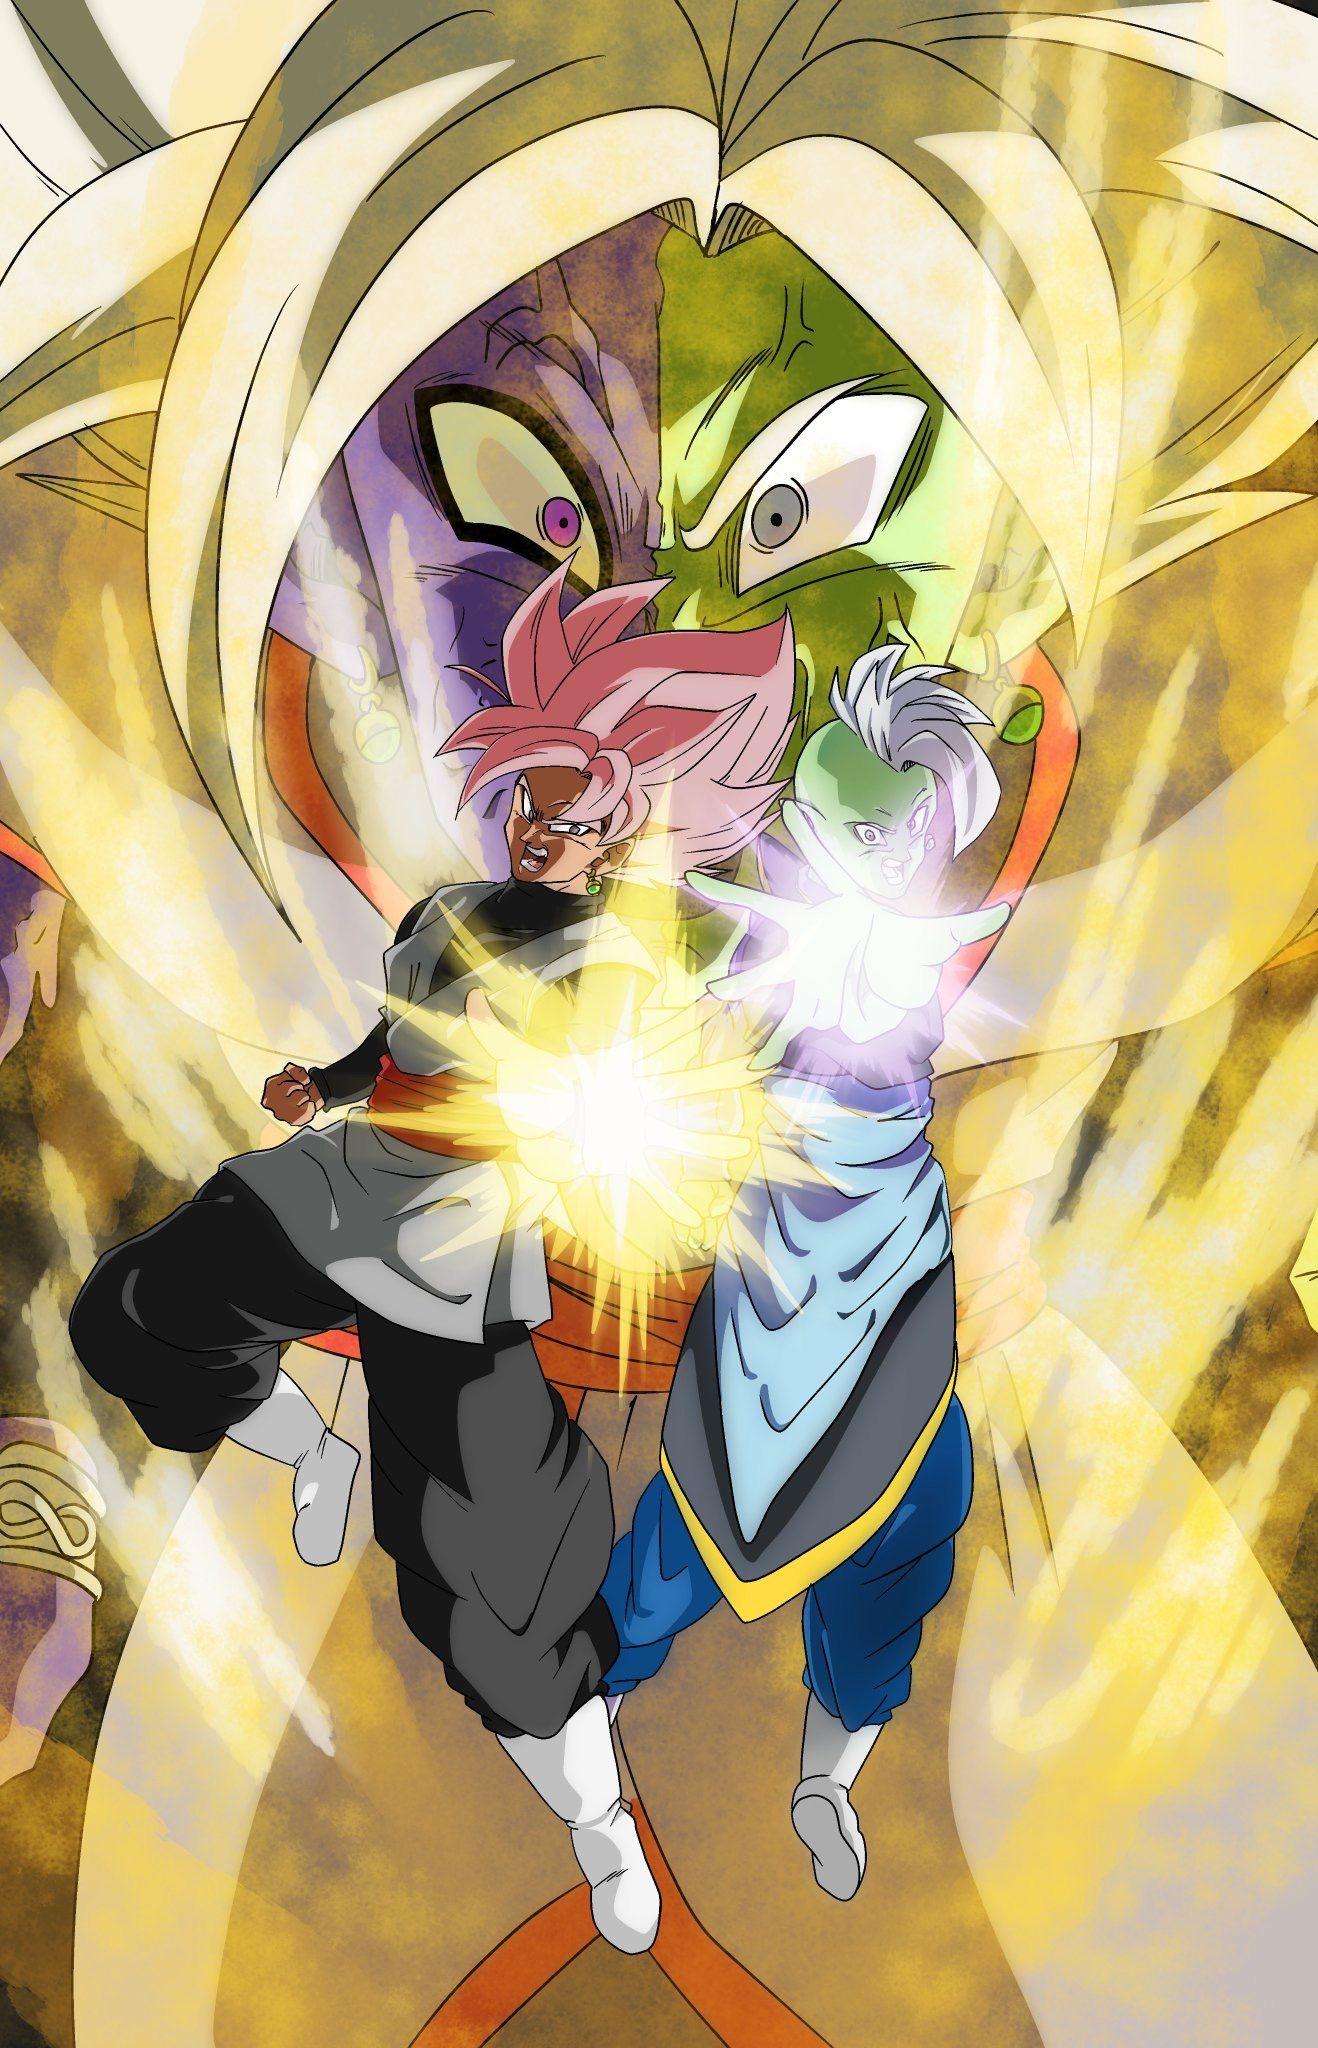 Pin by Ashley Saxton on Anime | Anime dragon ball super